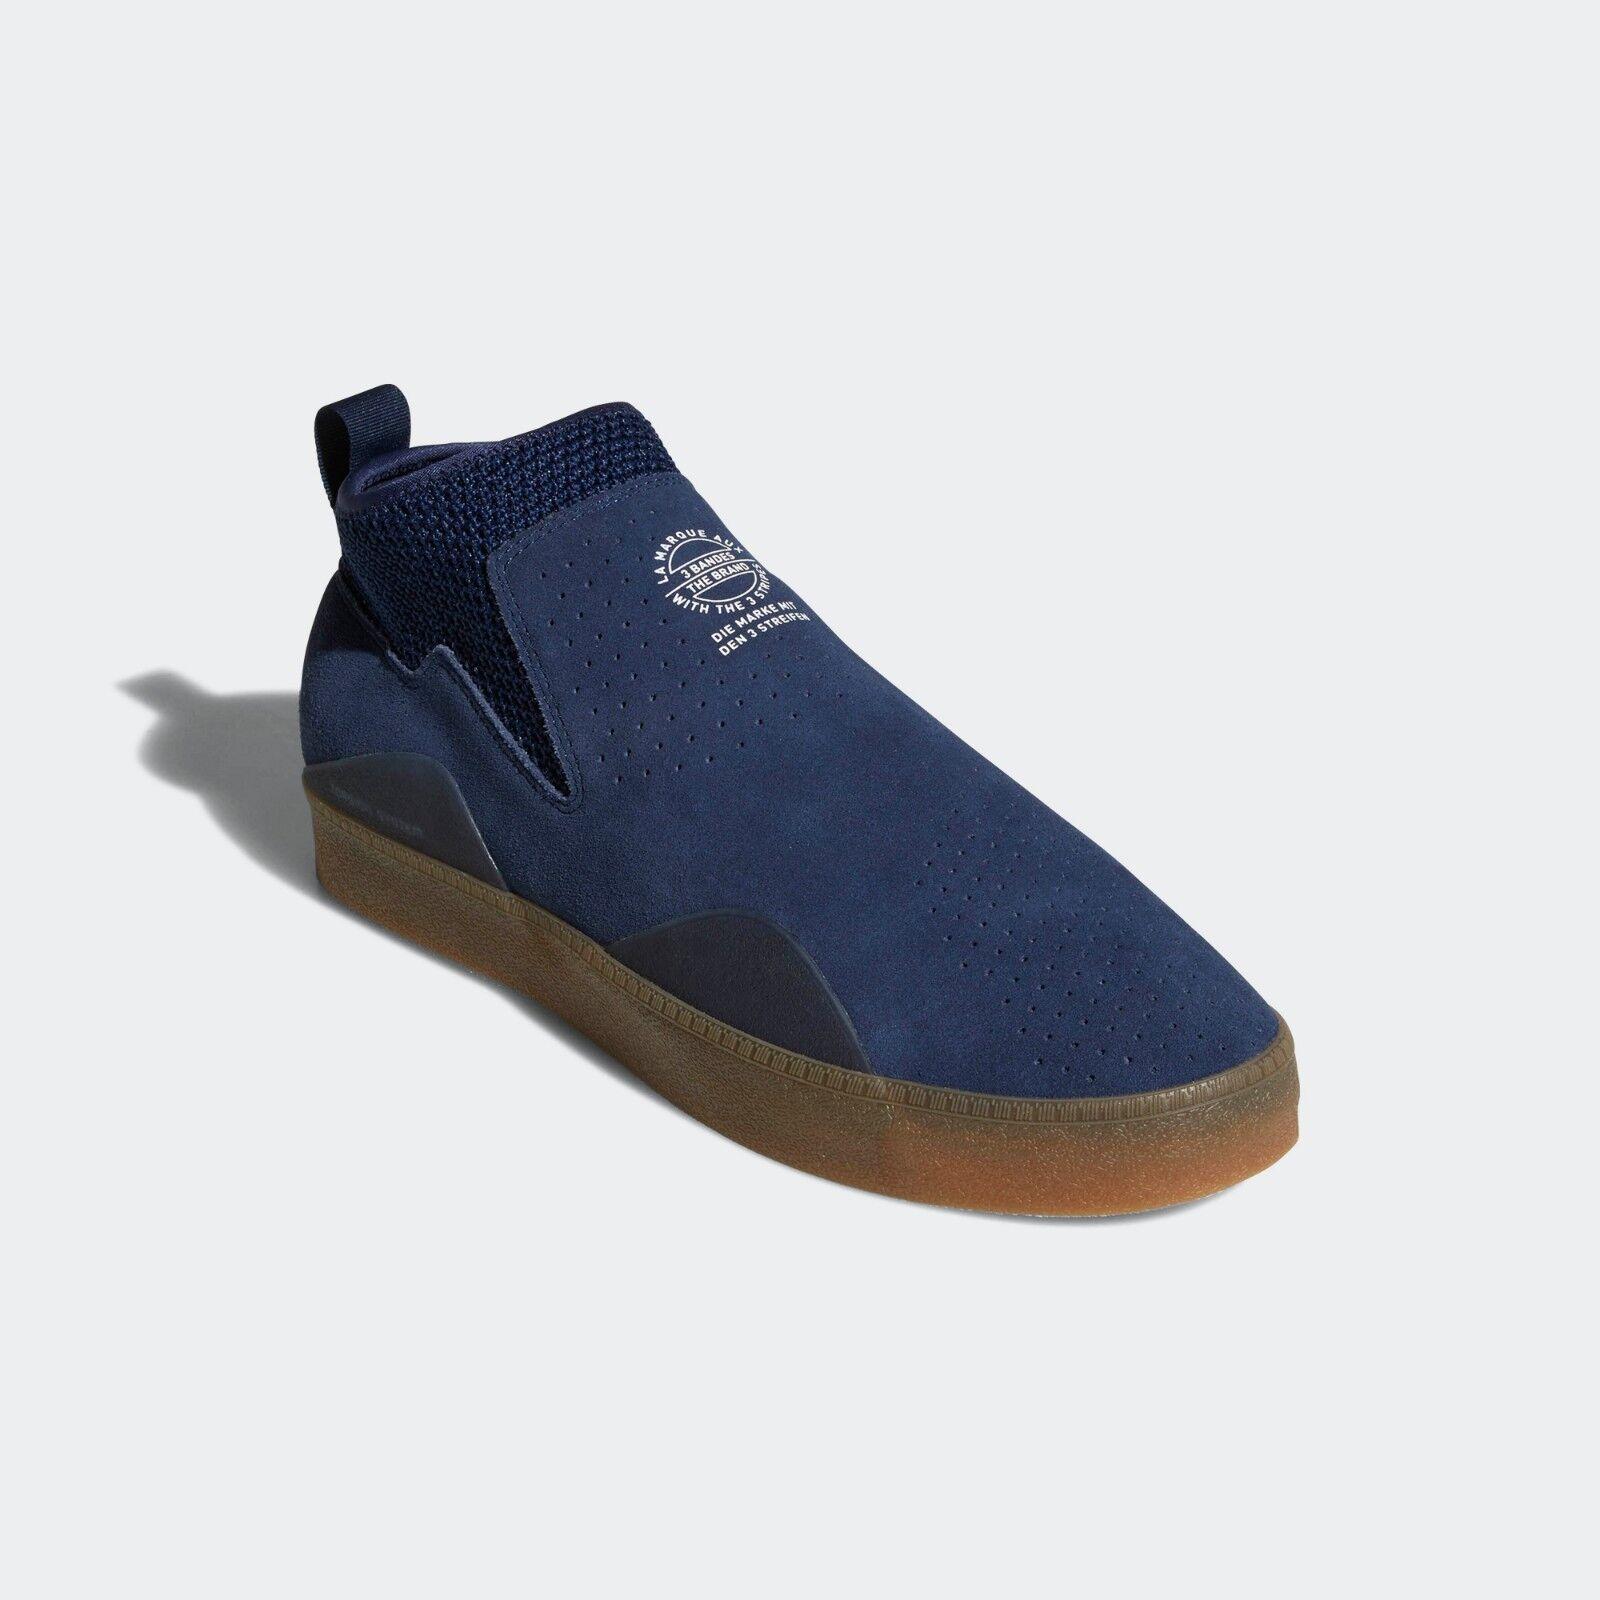 online store 16646 2f30f adidas skate raie chaussures chaussures chaussures chaussures bottes cq1204  721afe